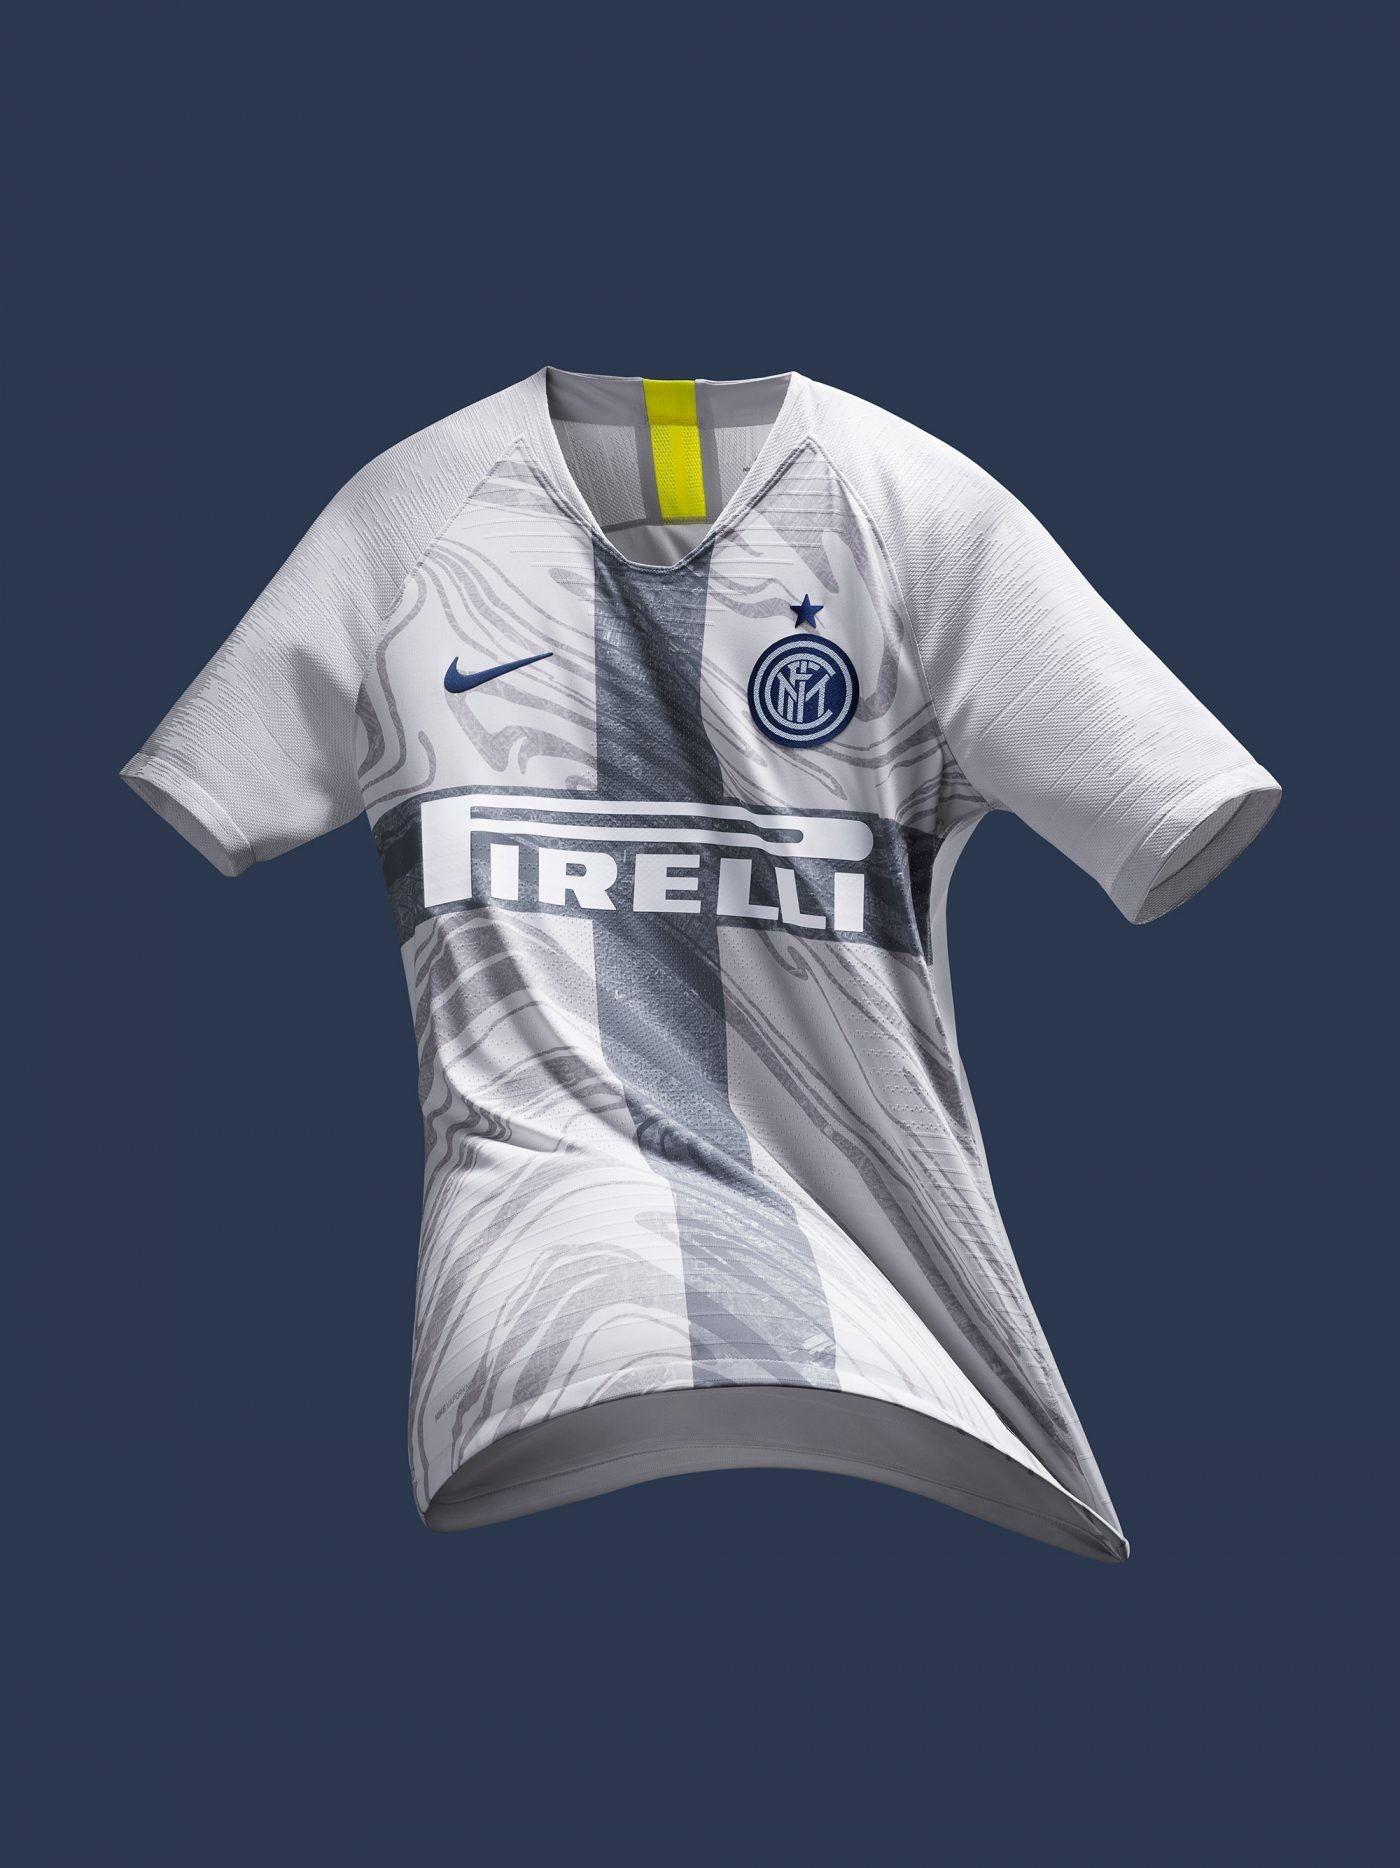 Pin De Exclusivas Shivanil Em Maillots De Foot Et Basket Camisetas De Futebol Futebol Camisas De Futebol